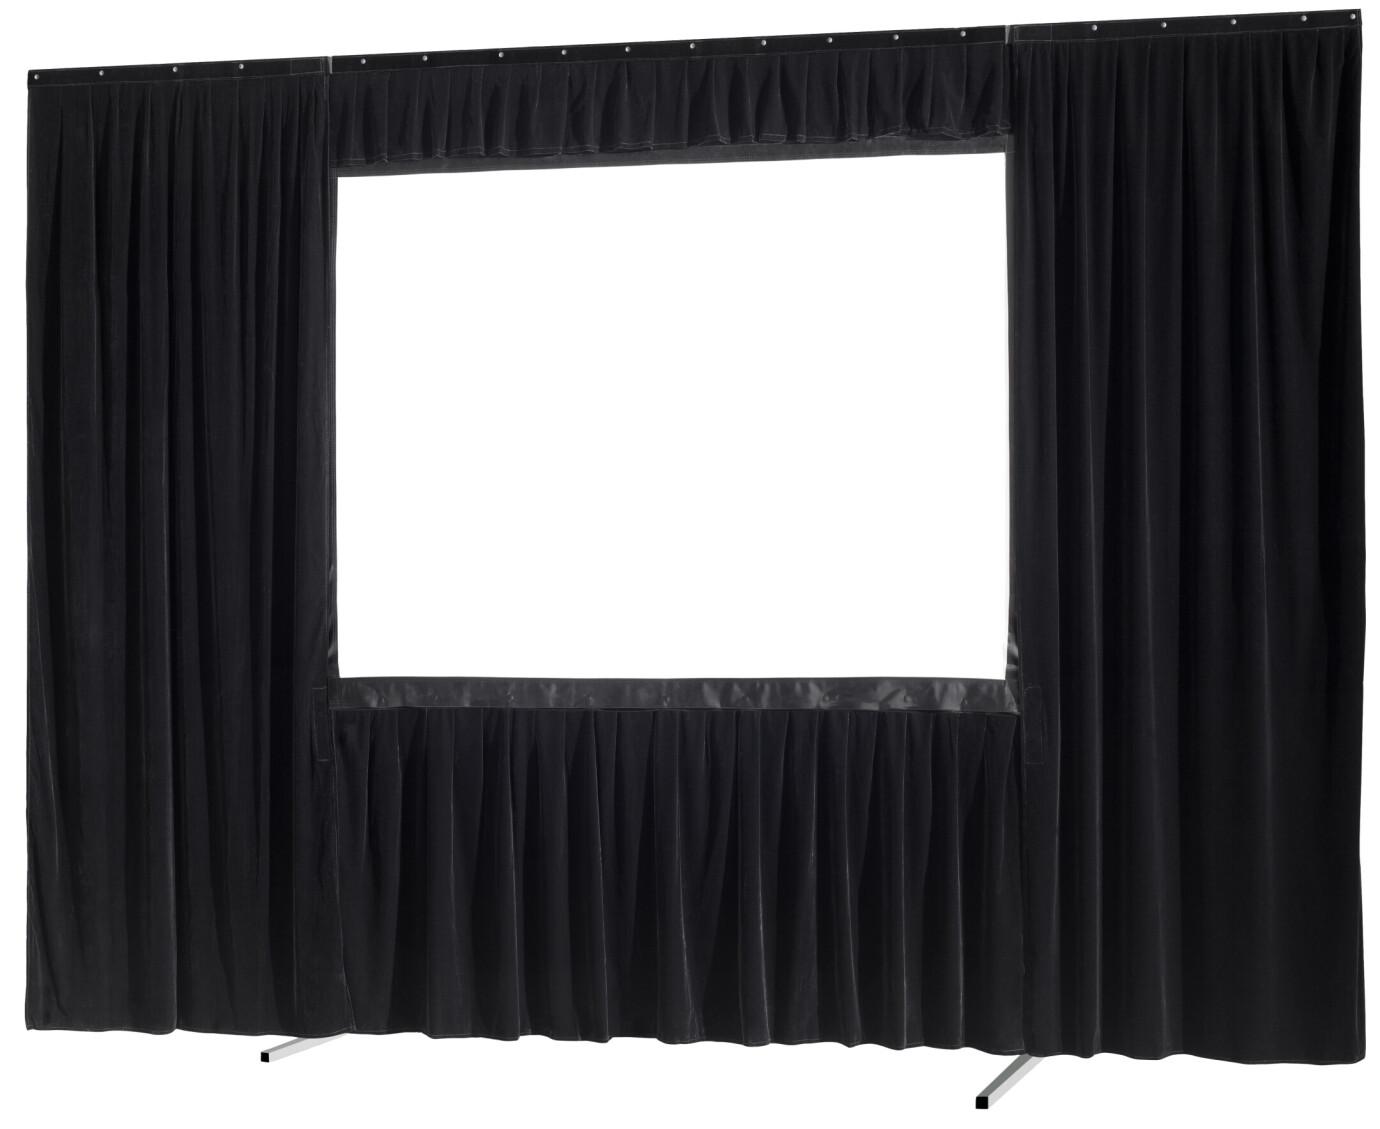 celexon Vorhangset 4-seitig für Faltrahmenleinwand Mobil Expert 406 x 305 cm